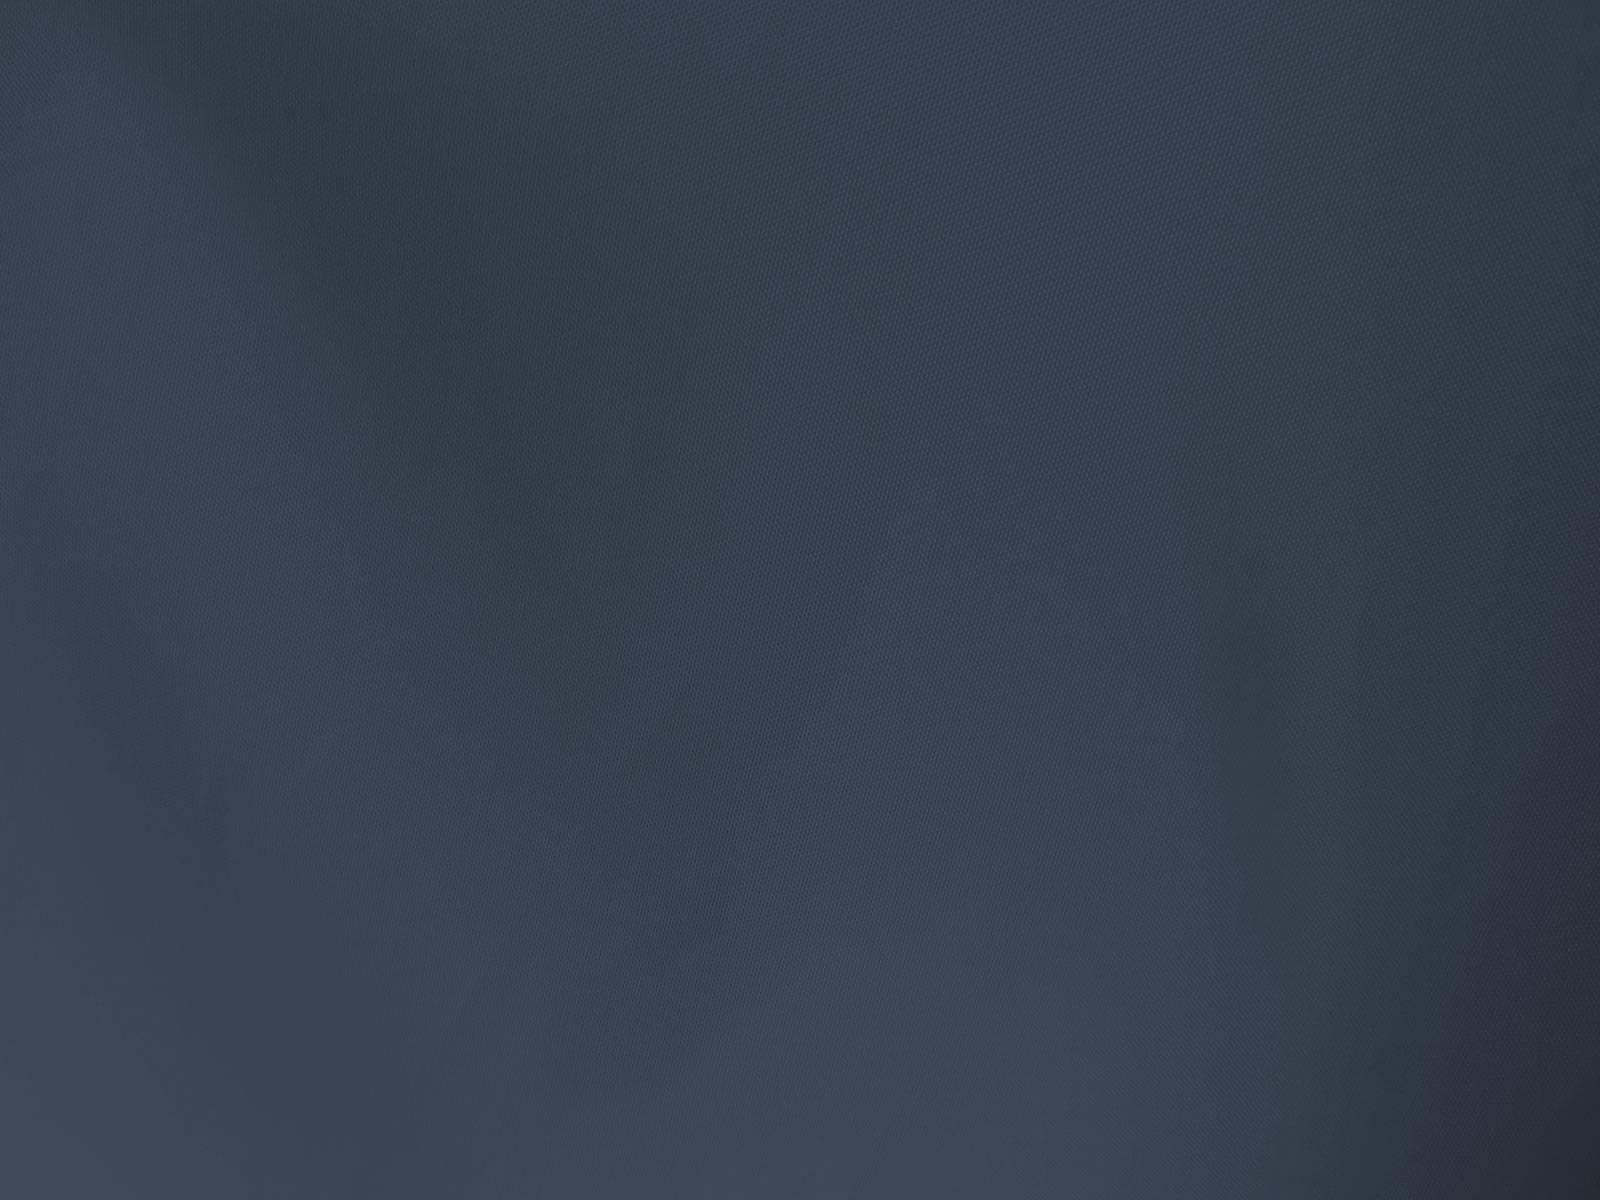 blackout vorhang helsinki 100 abdunklung reinweiss beige grau schwarz. Black Bedroom Furniture Sets. Home Design Ideas